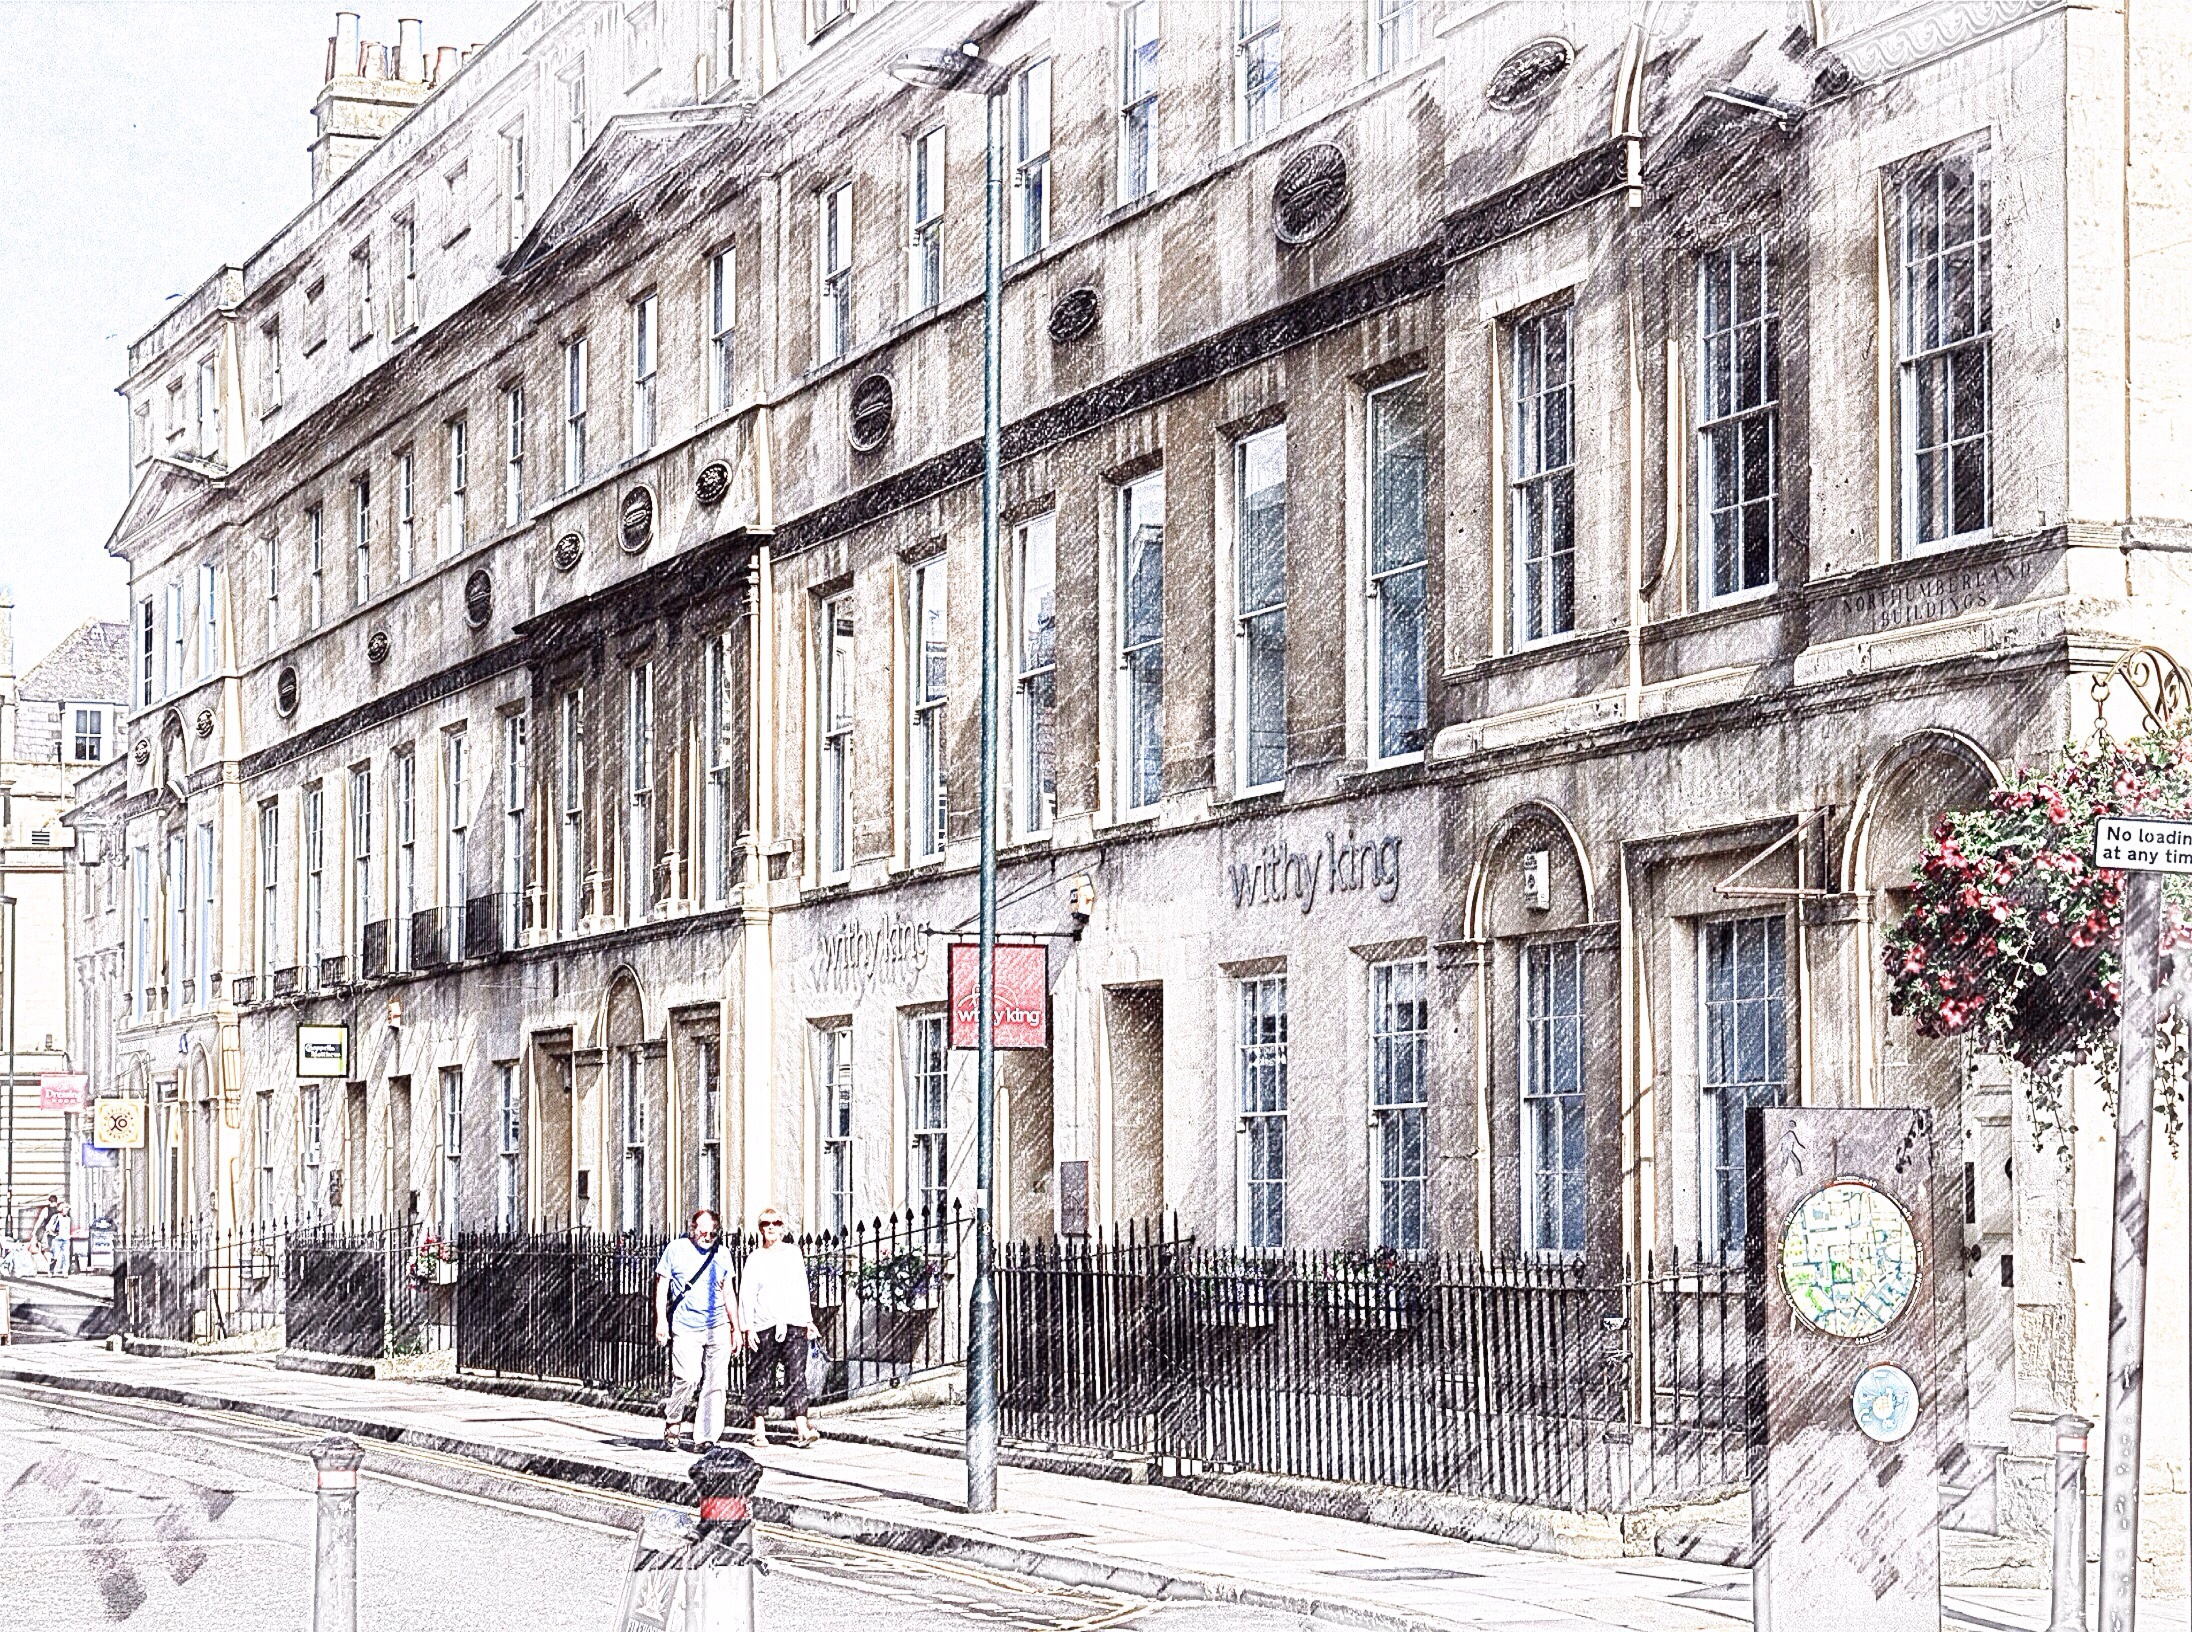 Northumberland Buildings